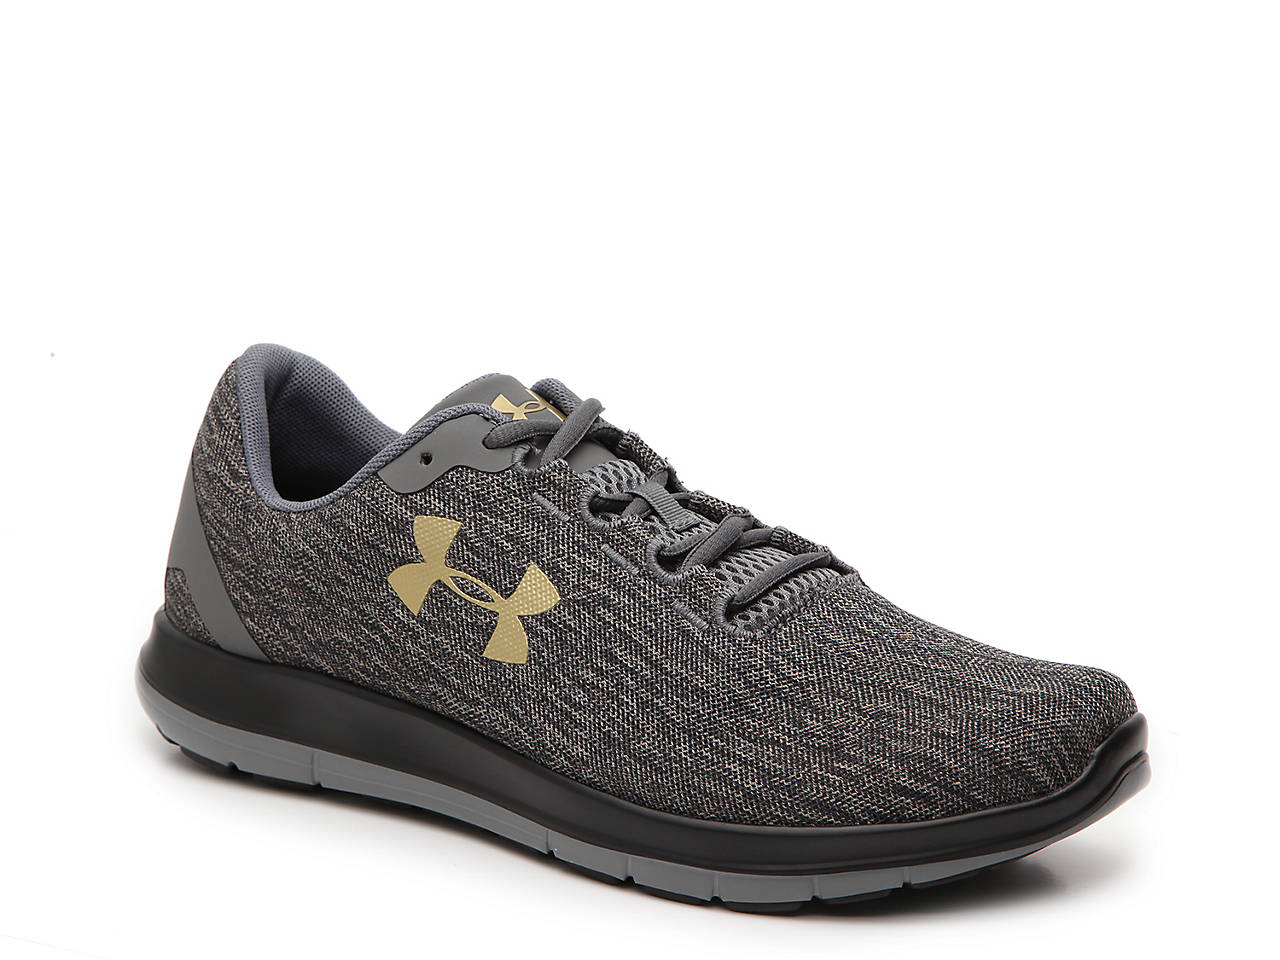 5a58a37a407df Under Armour Remix Running Shoe - Men s Men s Shoes